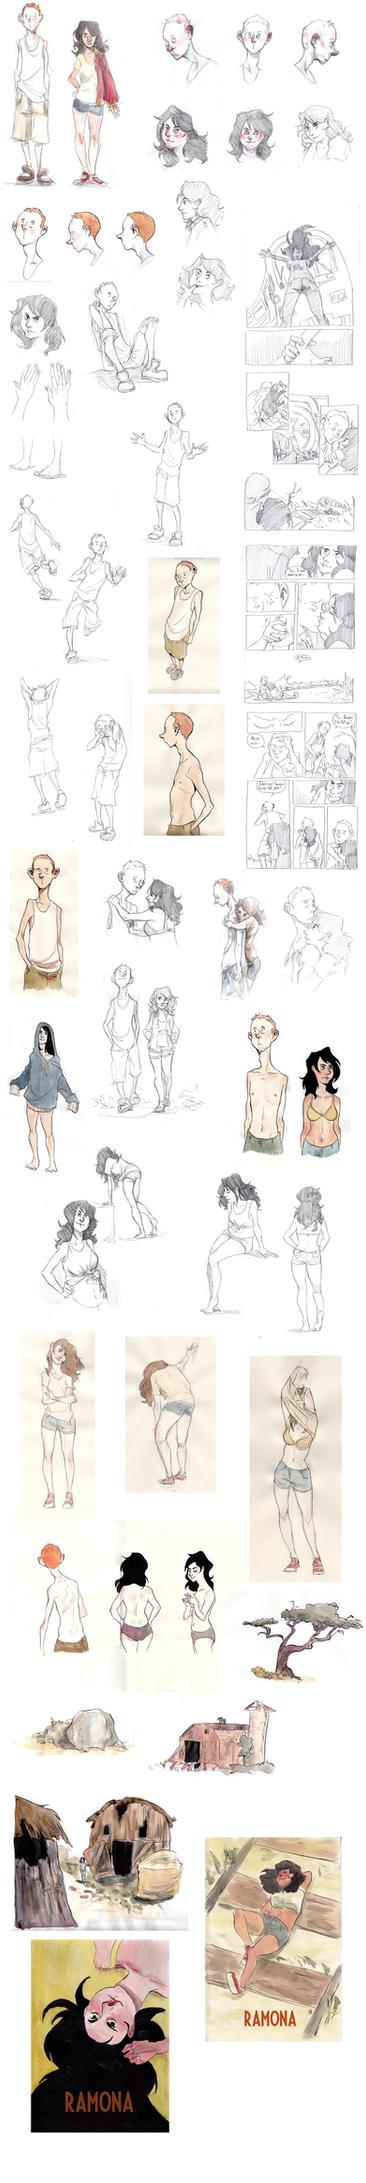 Ramona sketchdump by Le-Sushi